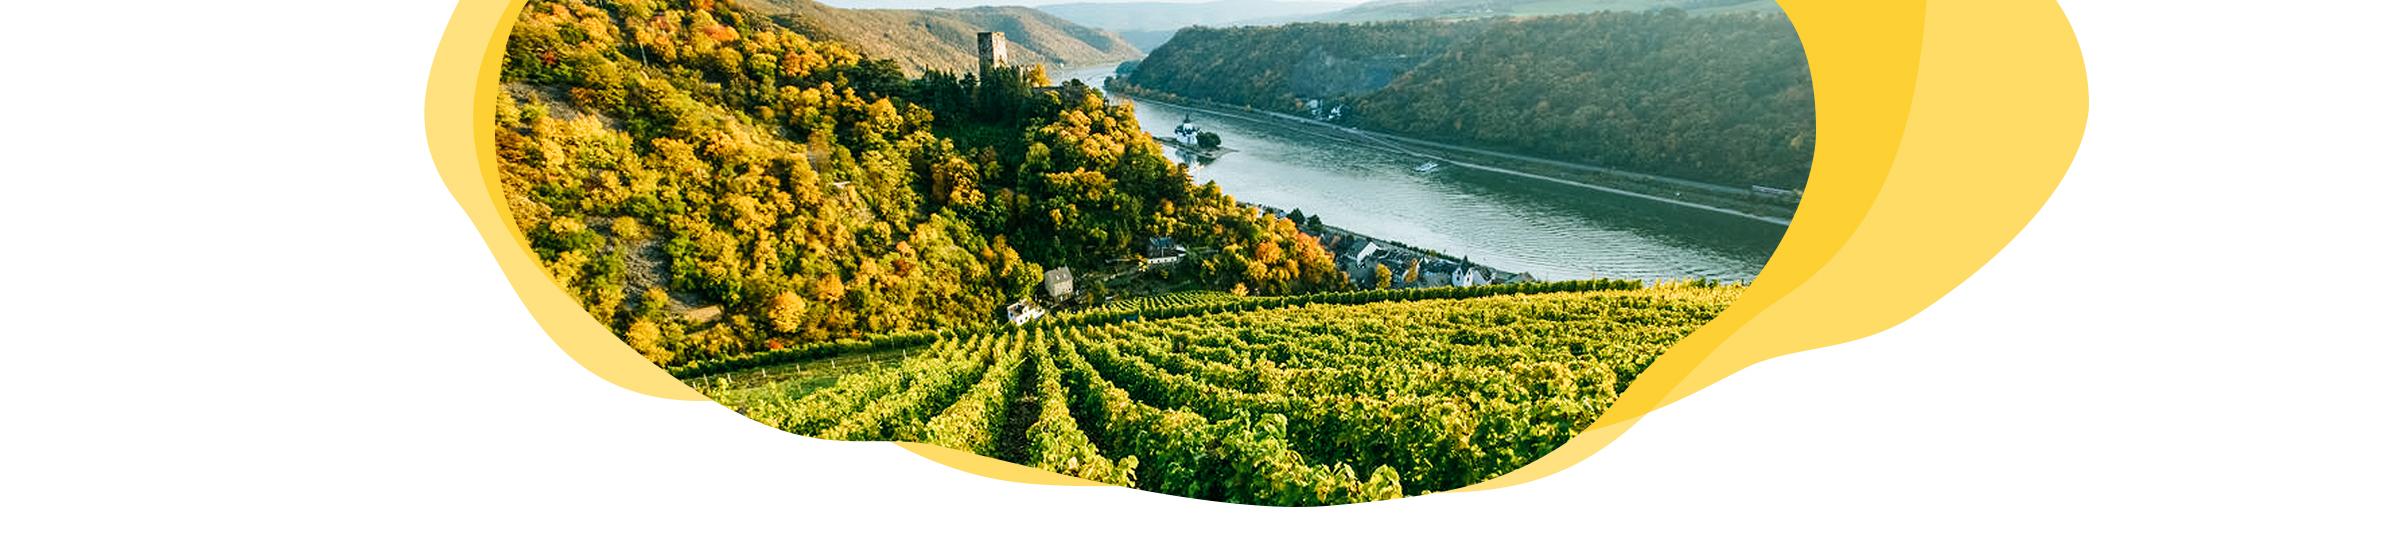 Digitale Reise Rheinland-Pfalz Header